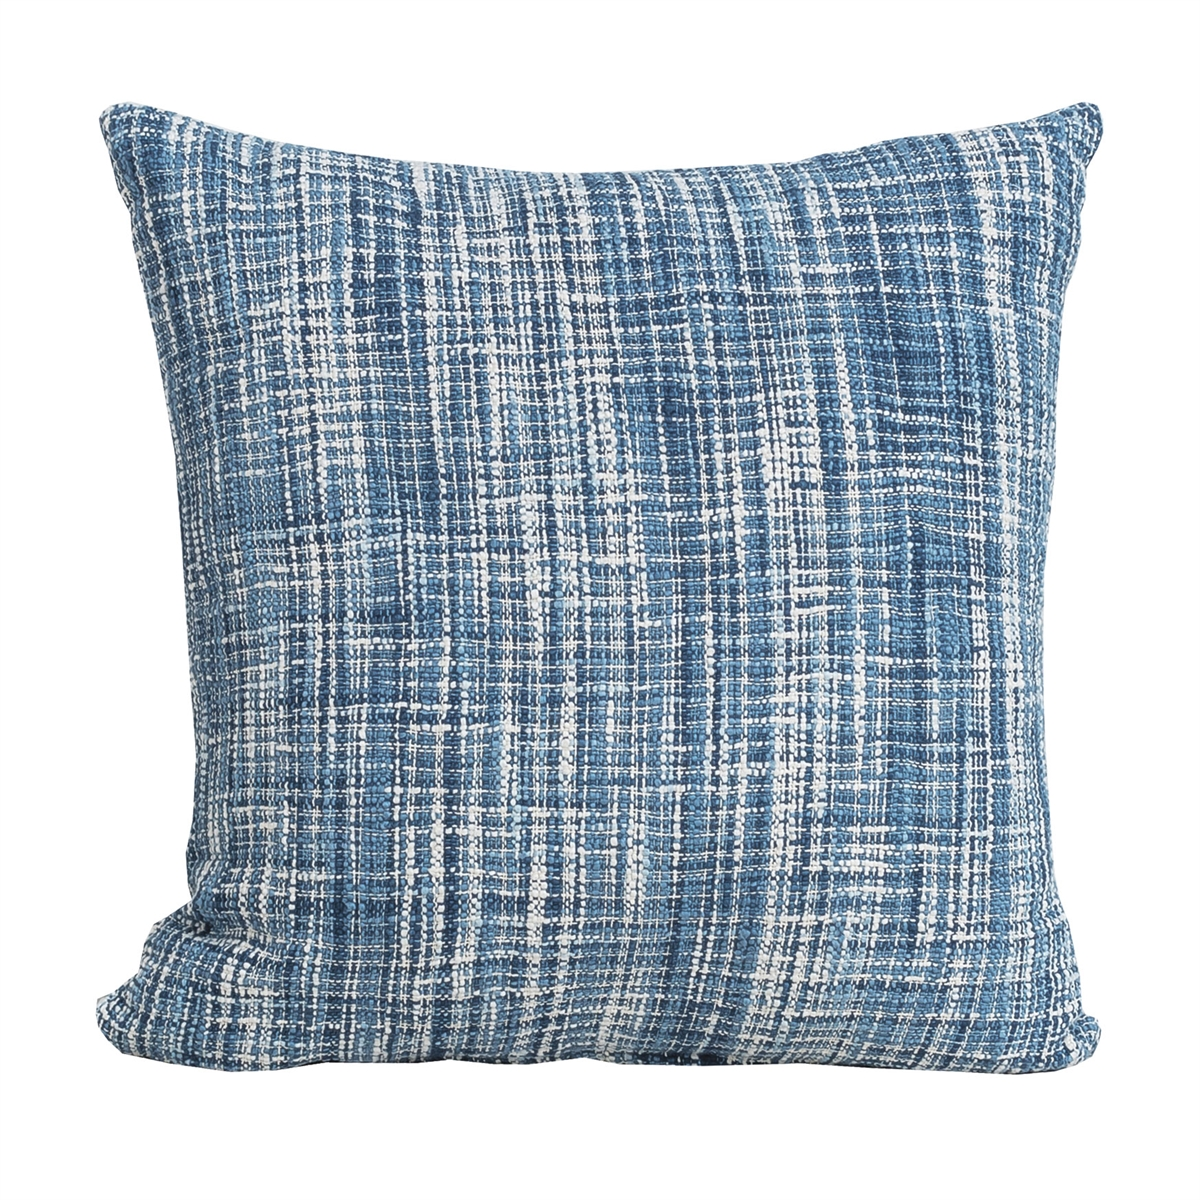 Decorative Pillows With Fringe Part - 26: ... Thatcher Indigo Pillow,carol U0026 Frank,Cotton Slub,Space Dyed,Fringe,